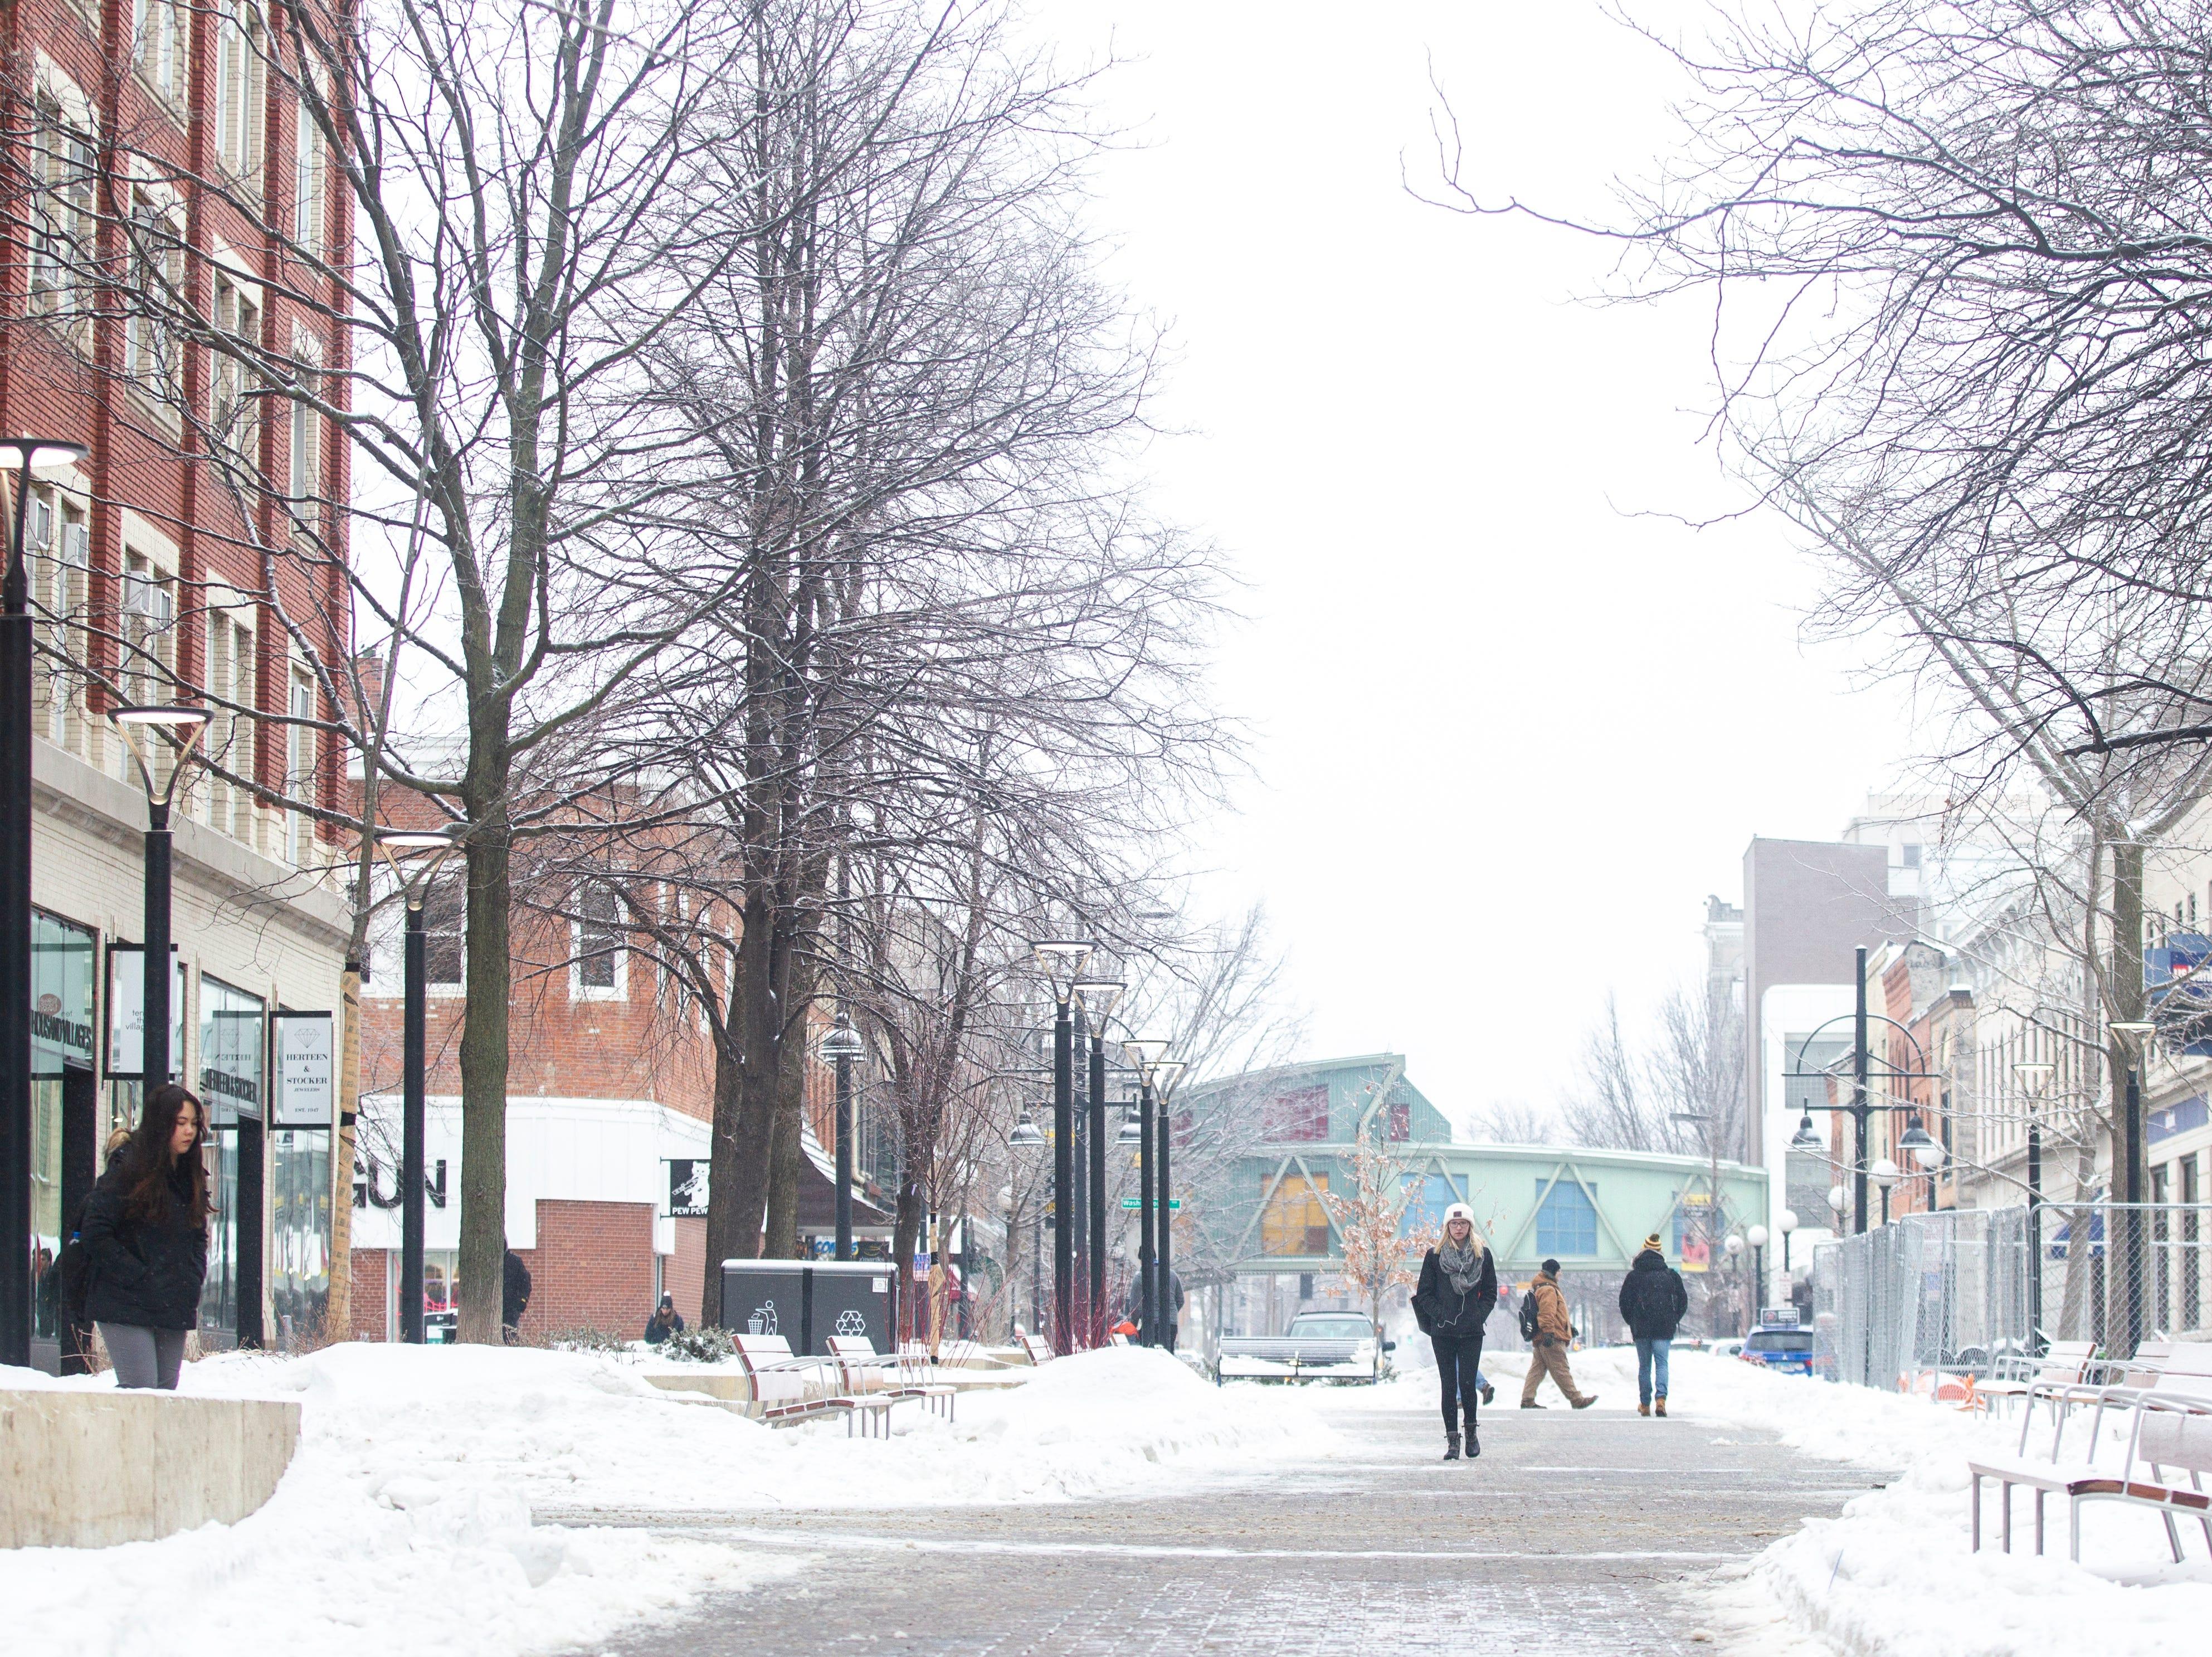 People walk through the pedestrian mall as light snow falls on Tuesday, Jan. 22, 2019, in Iowa City, Iowa.